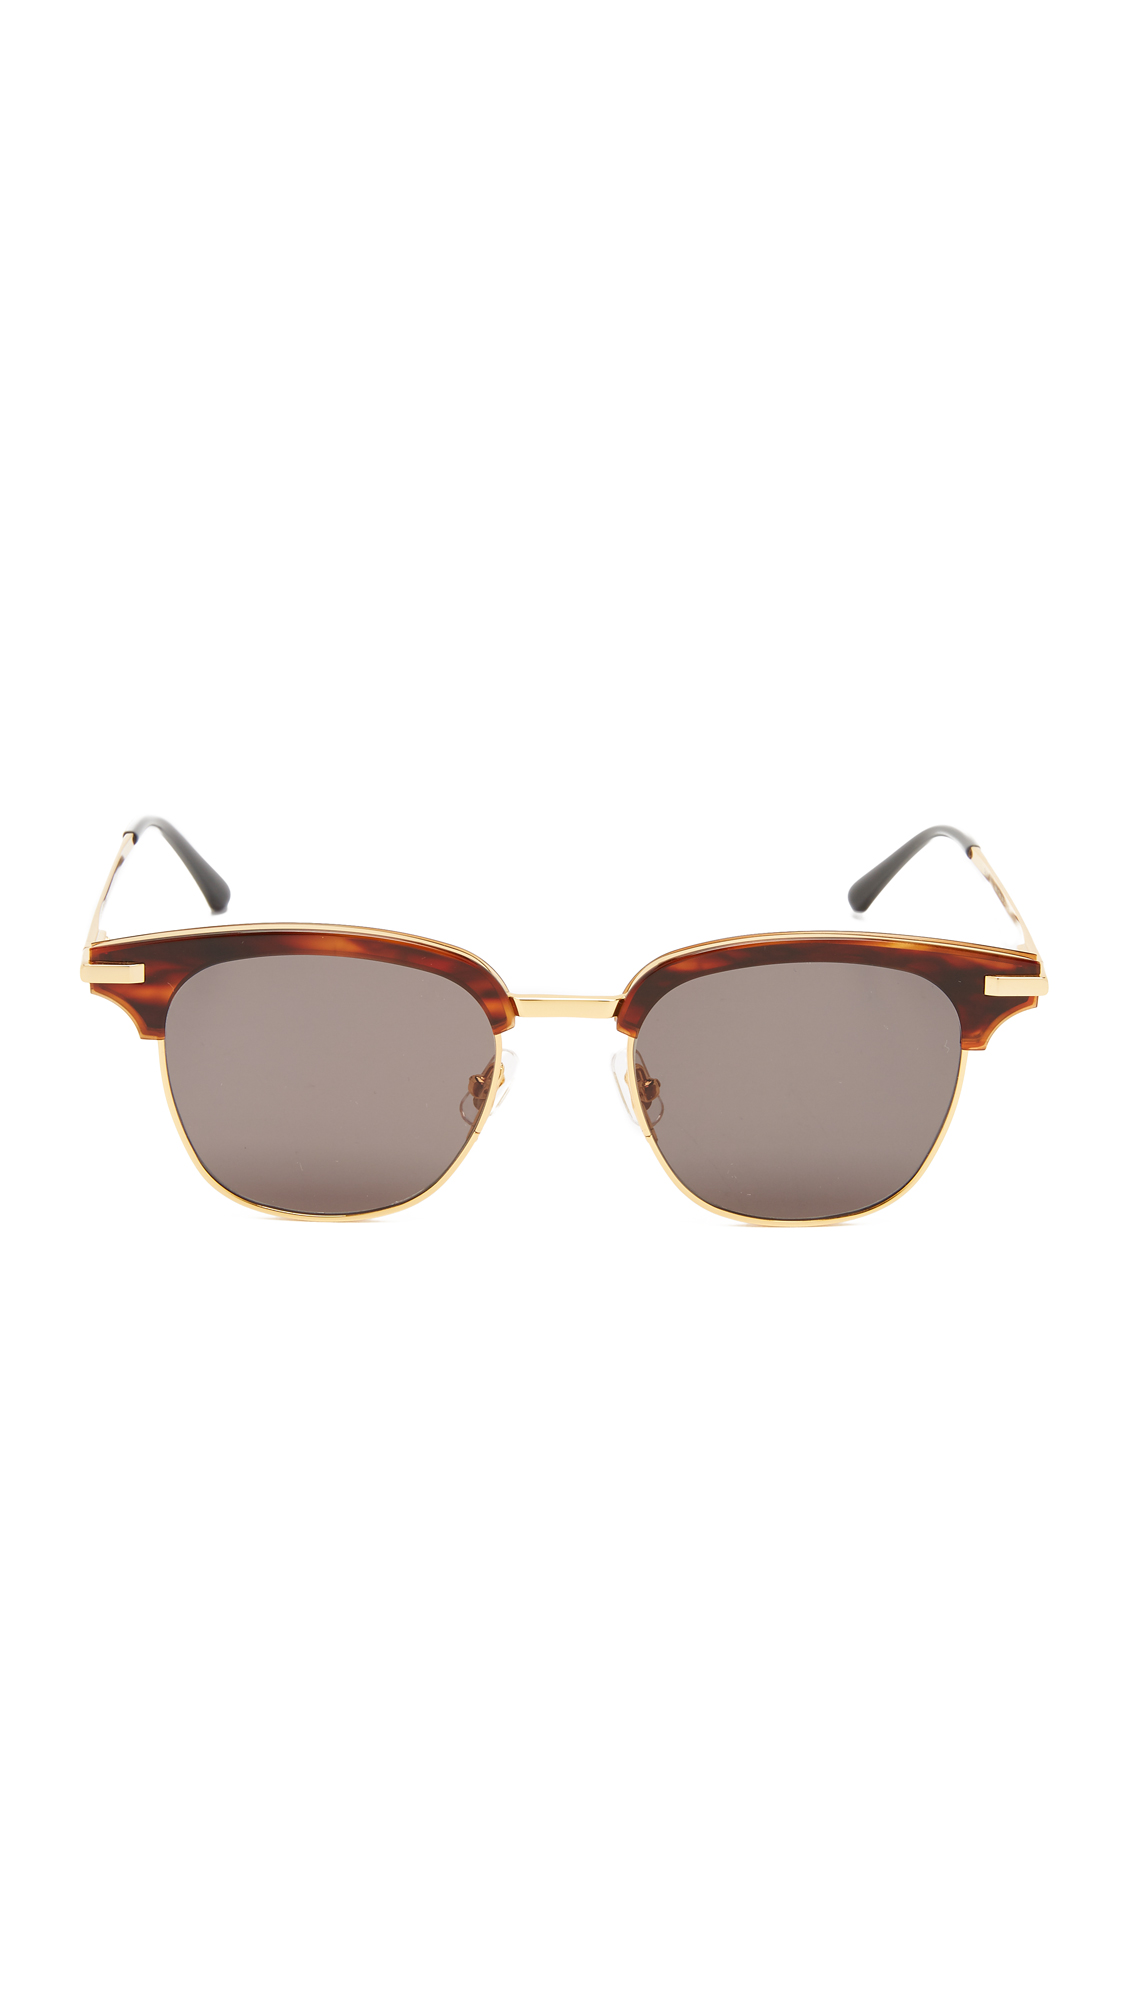 bfe823b4ca9 Gentle Monster Core 612 Sunglasses